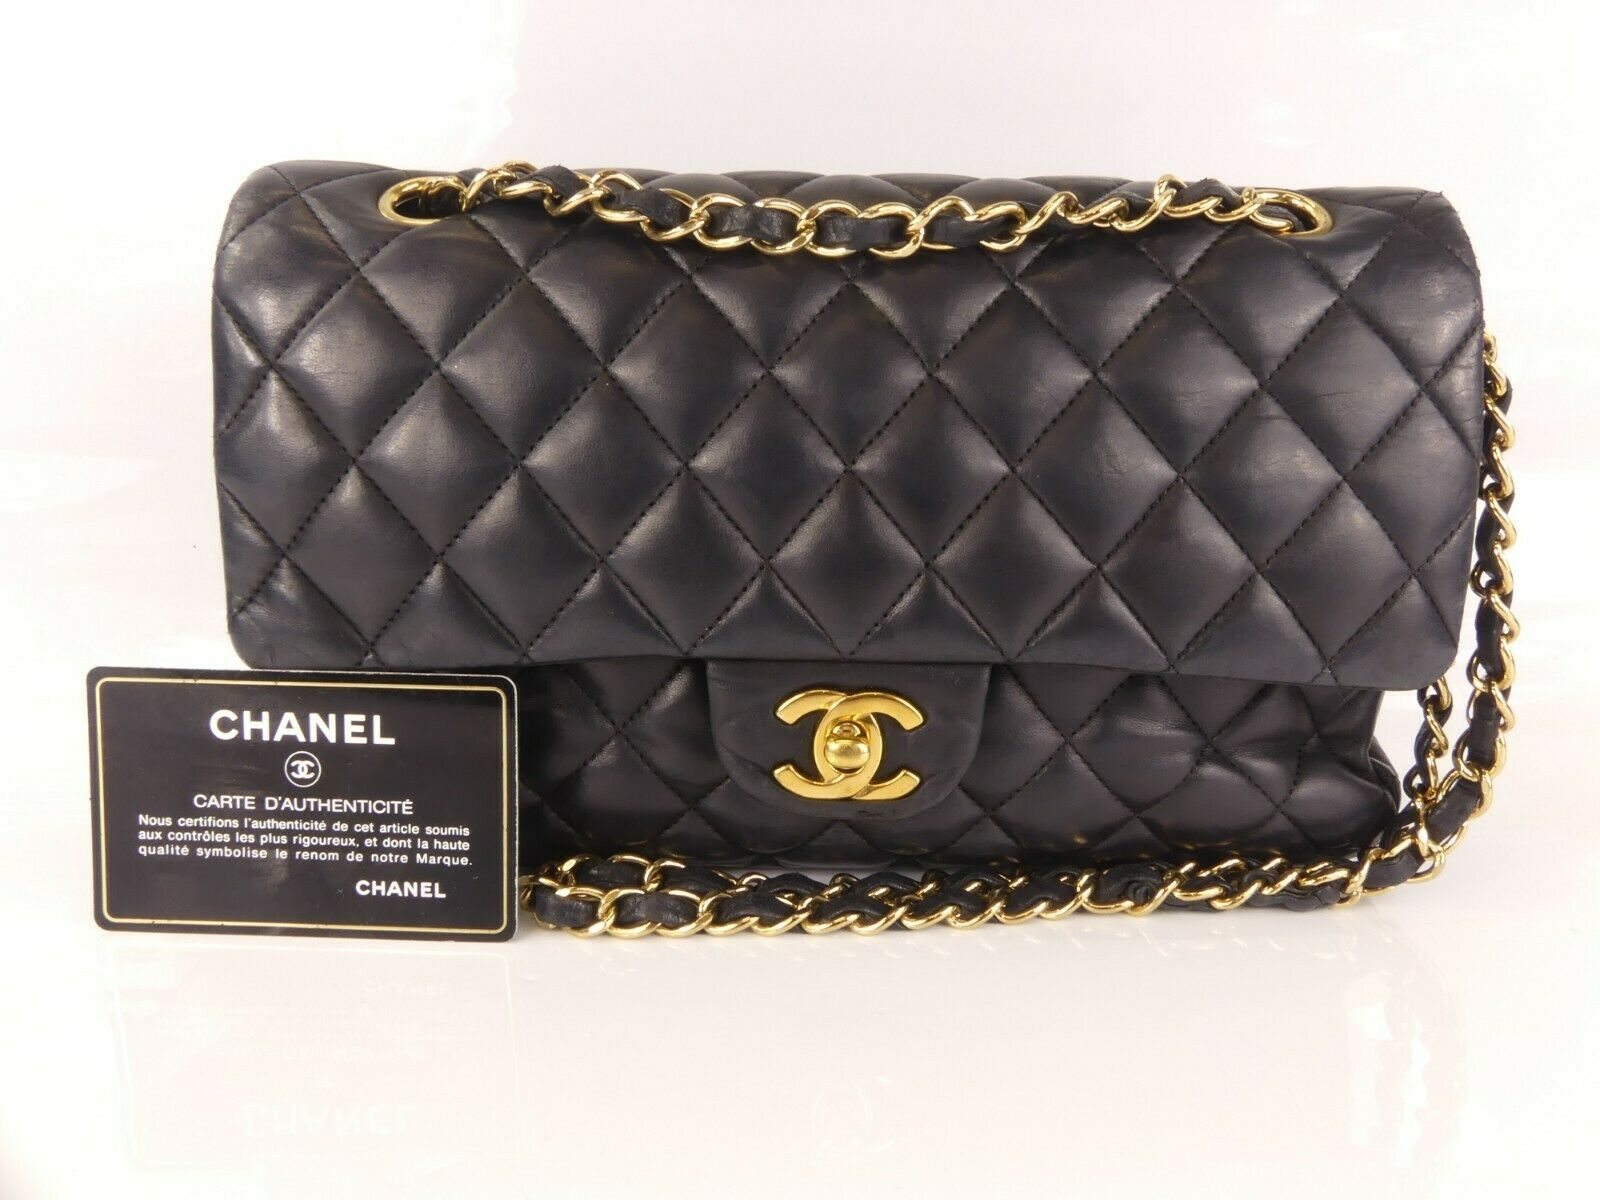 ffc5a525875 Details about CHANEL MATELASSE Diana flap CC logo shoulder bag leather  black gold Metal in 2019